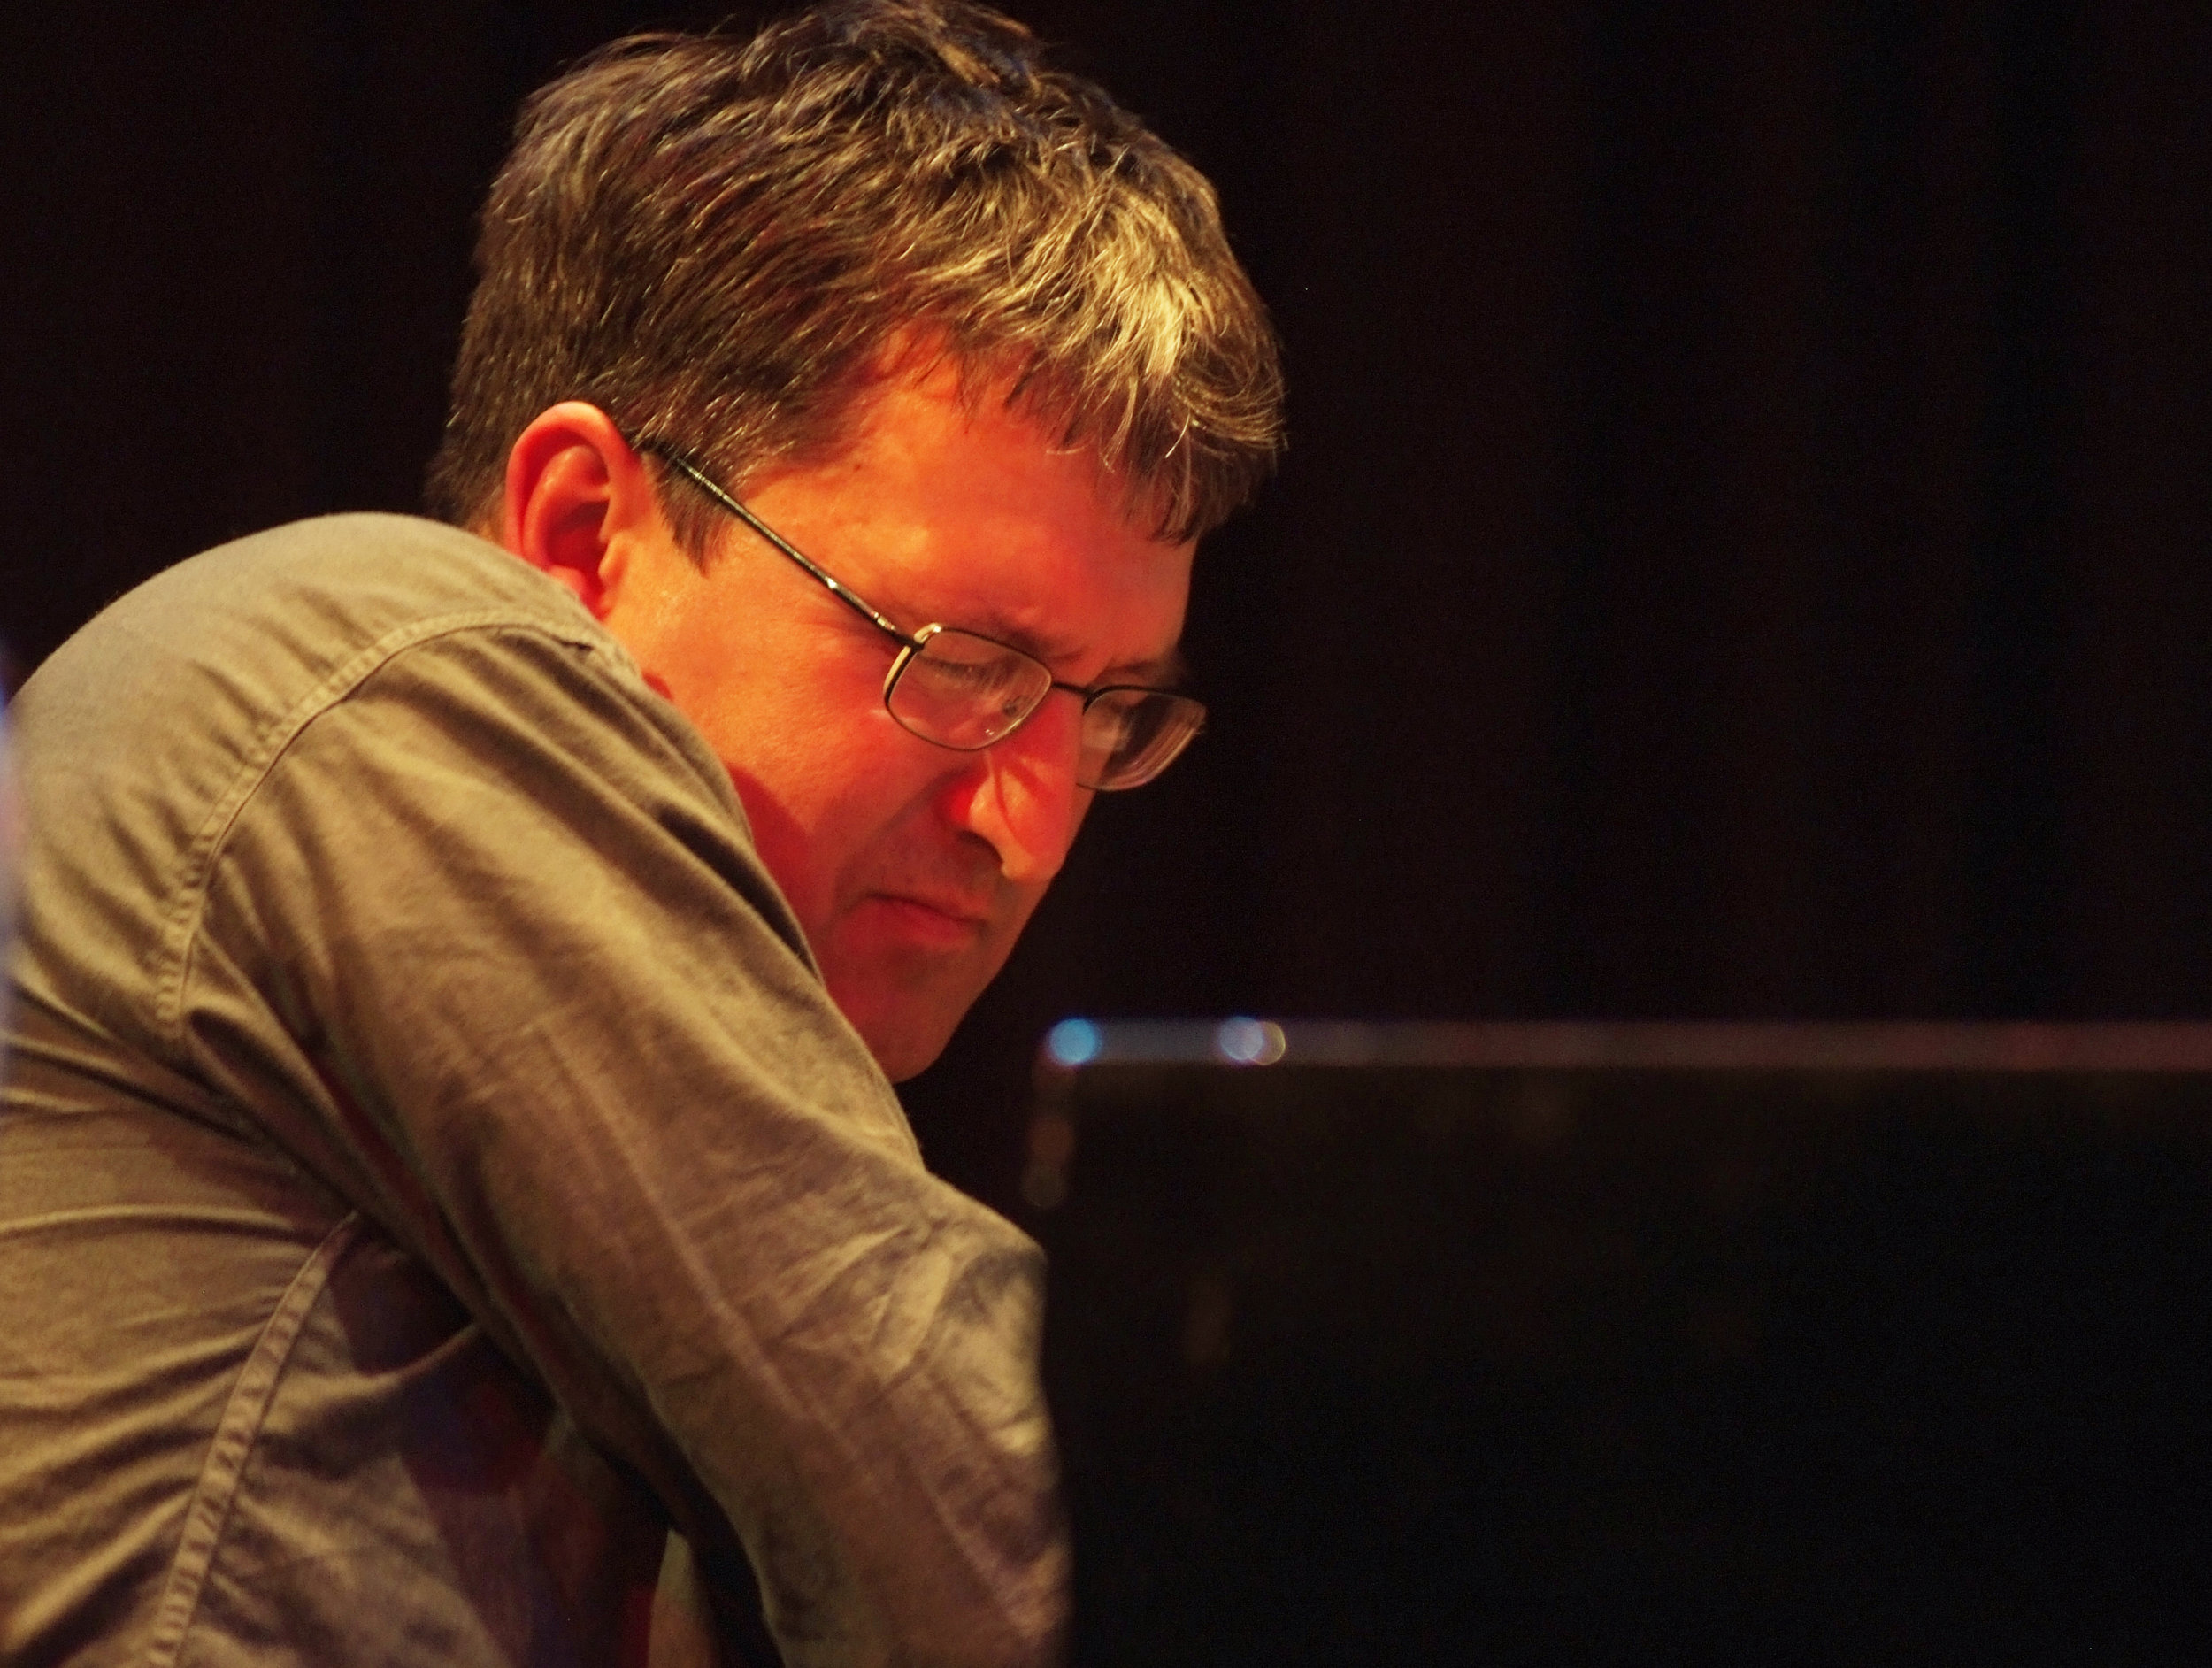 John Law (photo by Bob Meyrick)